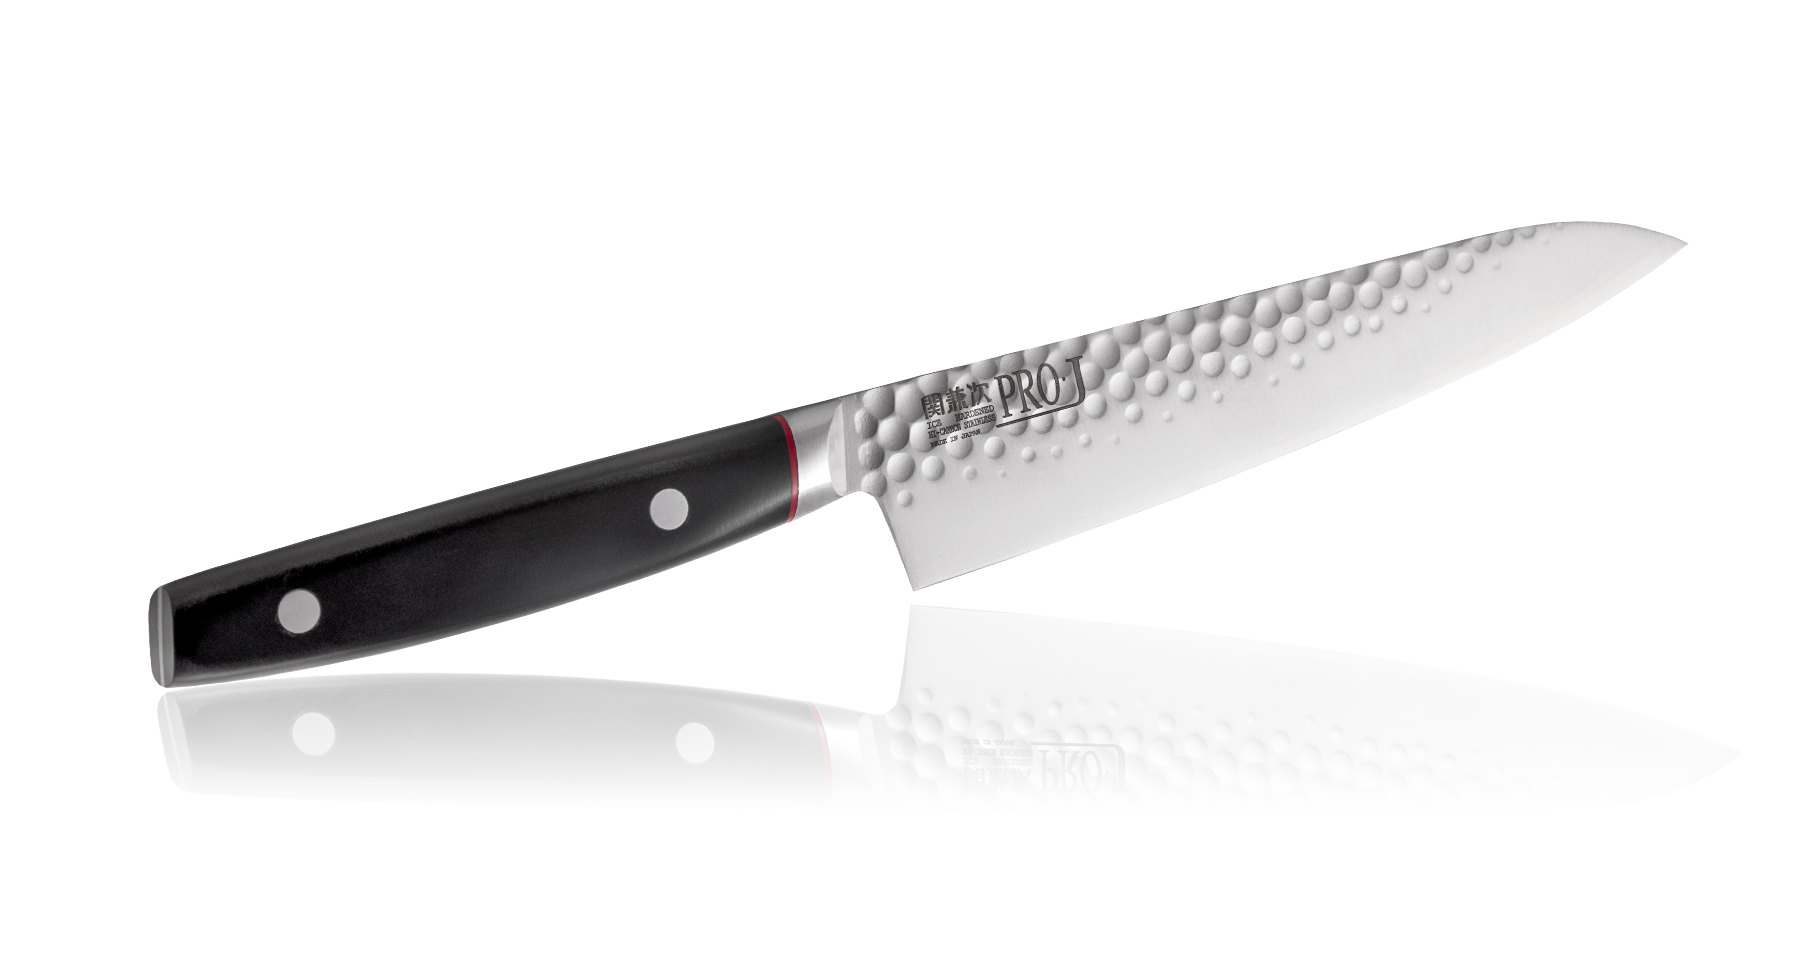 Нож Универсальный Kanetsugu Pro-J 150 мм, сталь ZA-18Tojiro<br>Нож Универсальный Kanetsugu Pro-J 150 мм, сталь ZA-18<br>